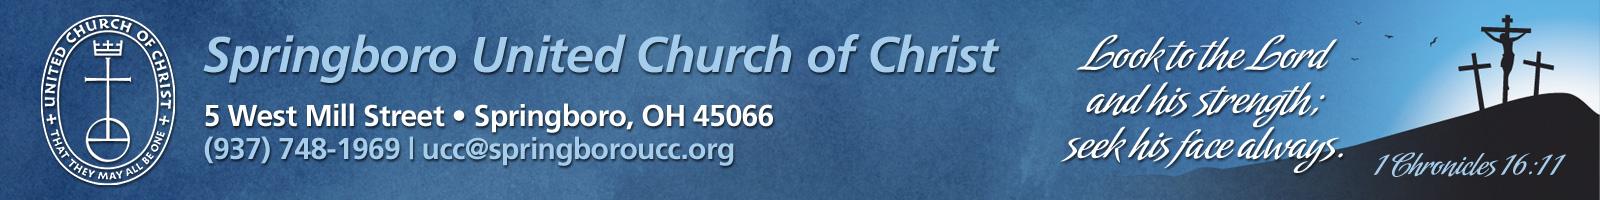 Springboro United Church of Christ Logo